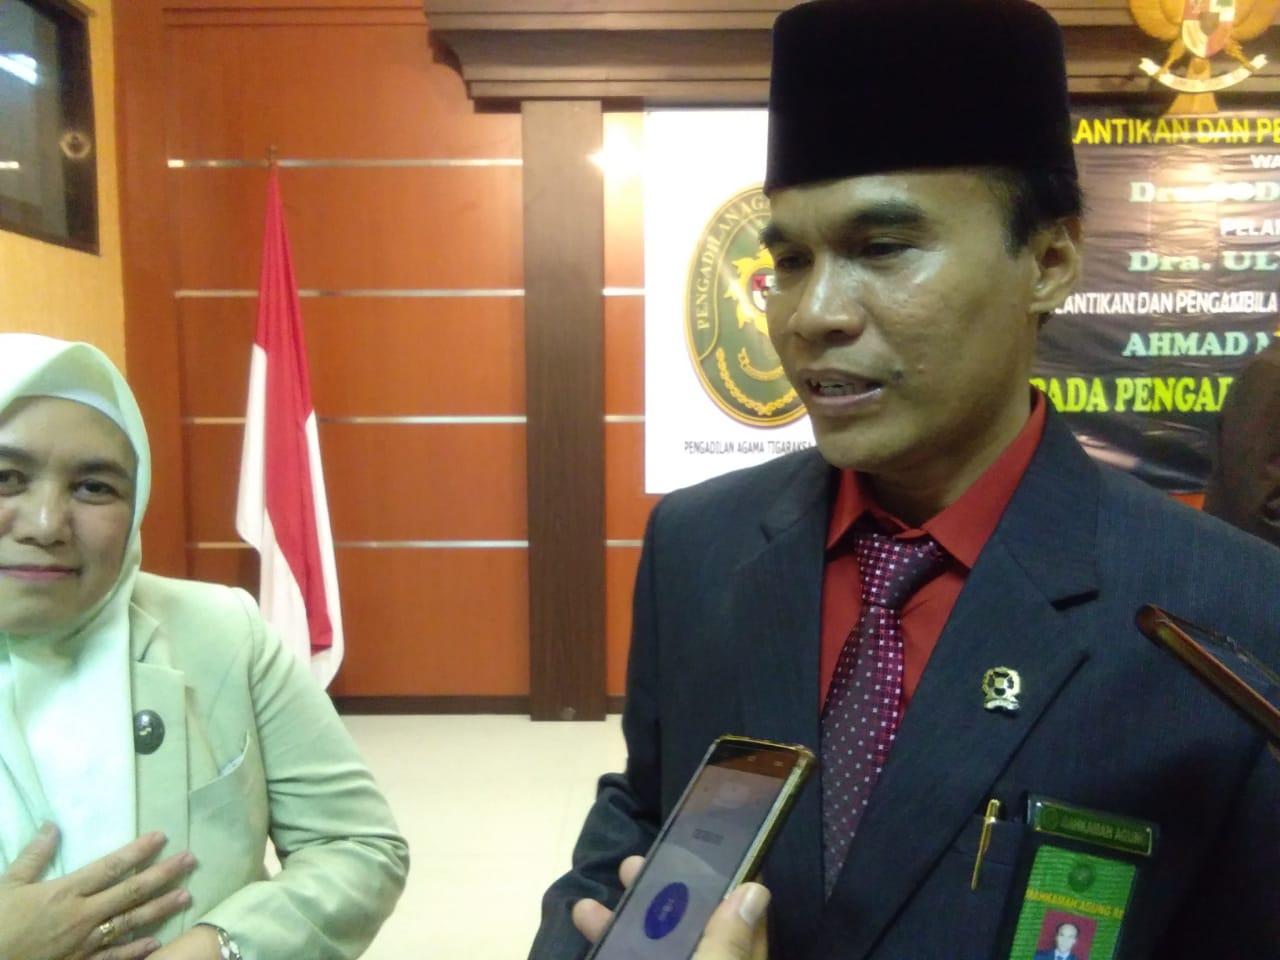 Sodikin, Wakil Ketua Pengadilan Agama (PA) Tigaraksa, Kabupaten Tangerang.